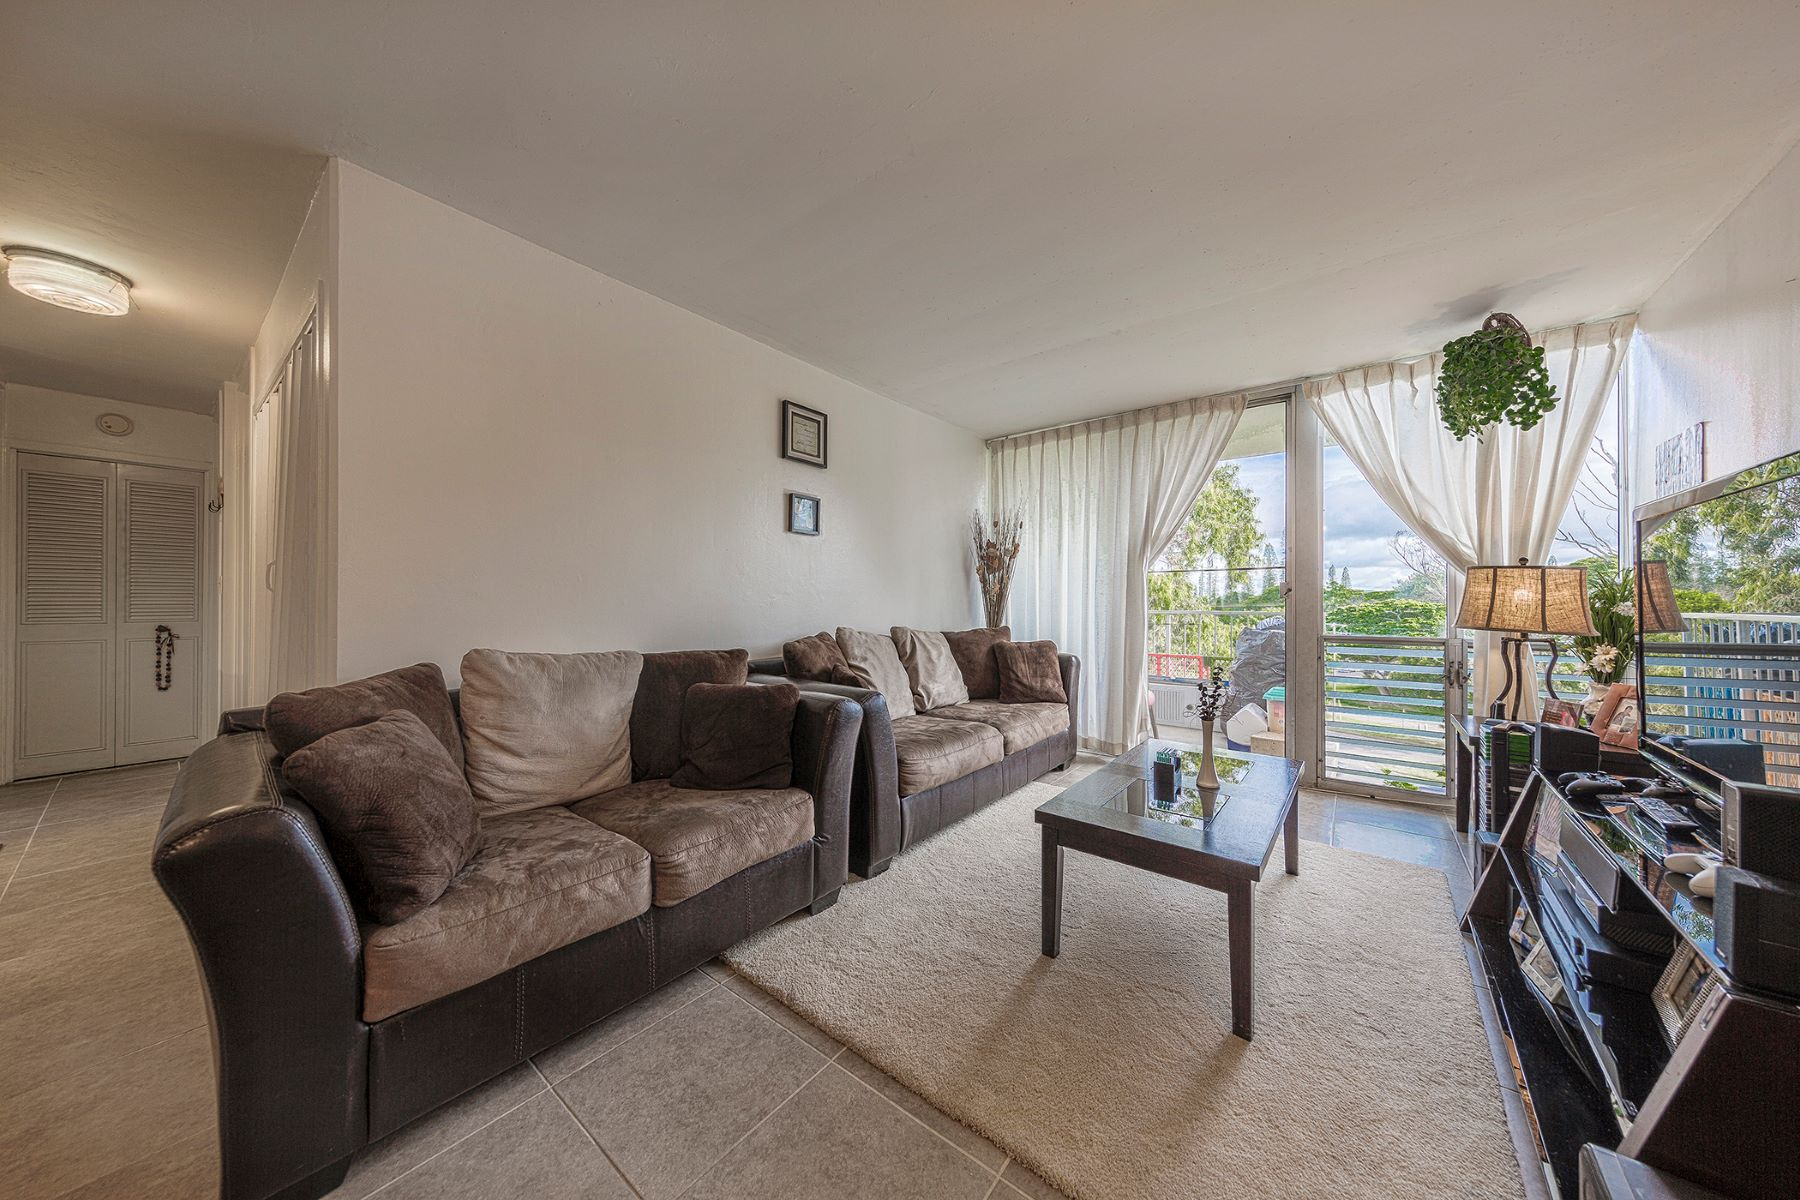 Appartement en copropriété pour l Vente à Quiet Woodwinds 1600 Wilikina Dr #A608 Wilikina, Wahiawa, Hawaii, 96786 États-Unis